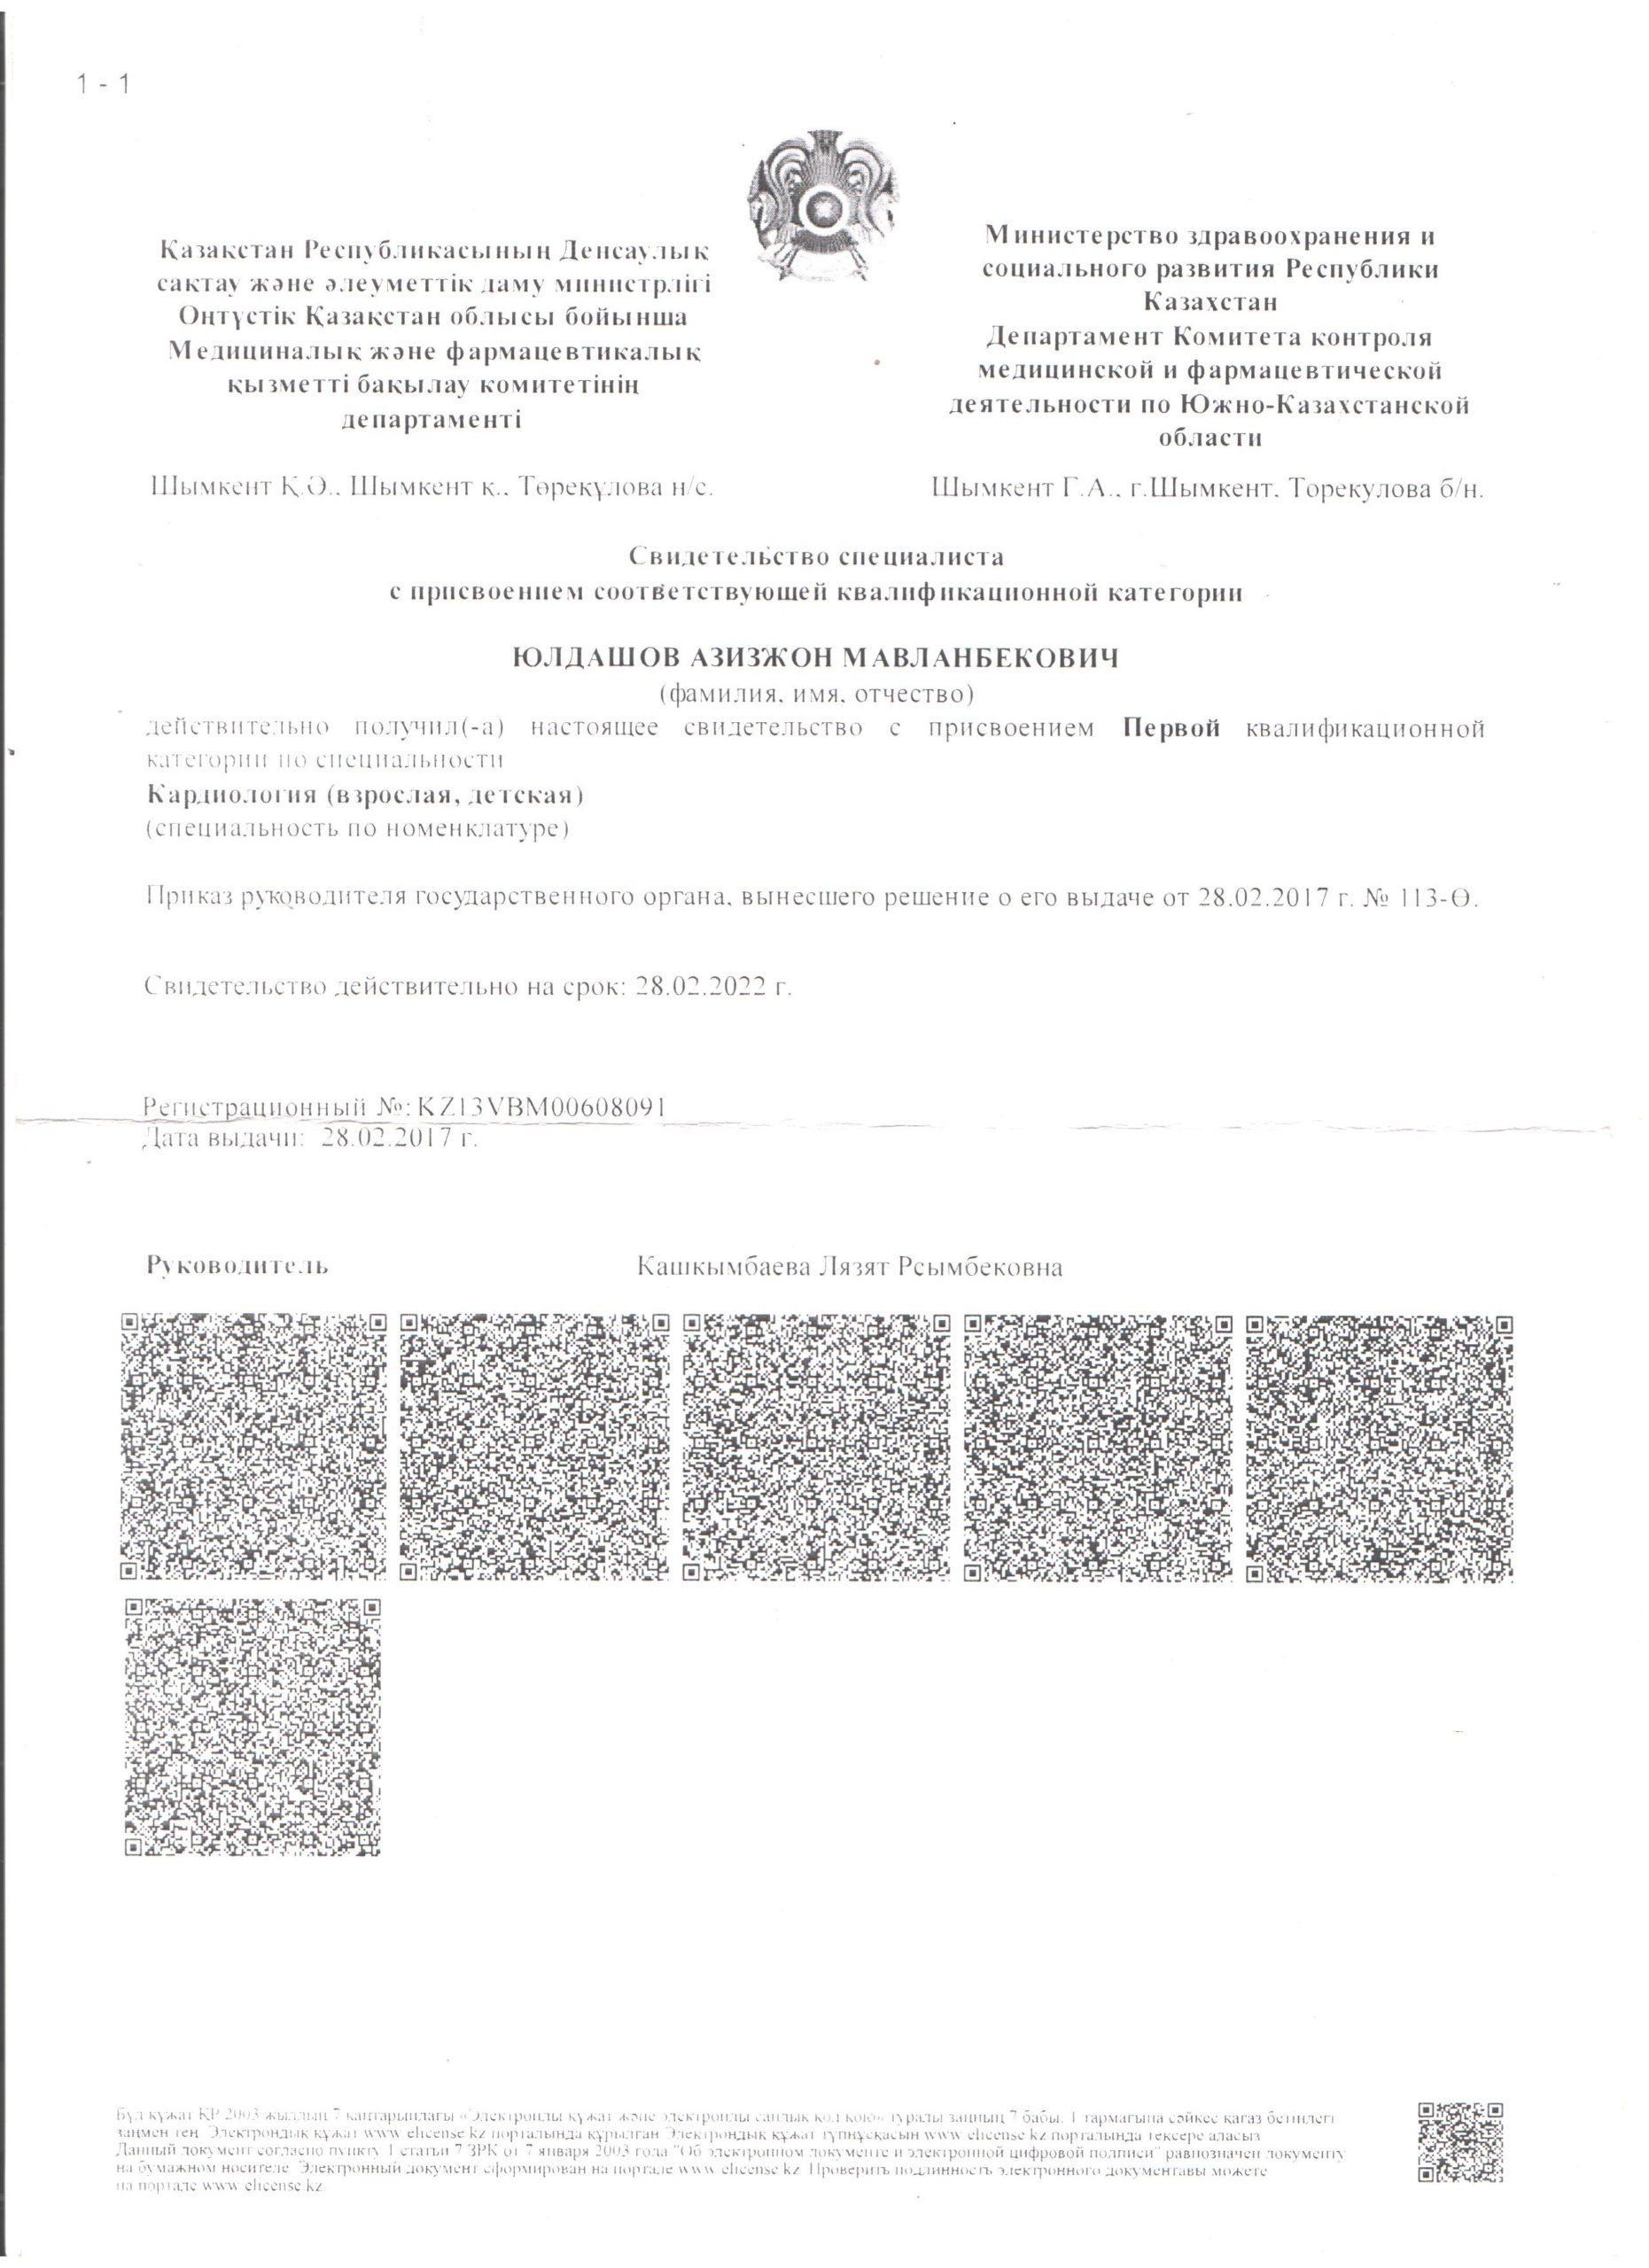 Сертификат Кардиолога клиники Akniet Shipa сайрамский р-н. с. Карабулак